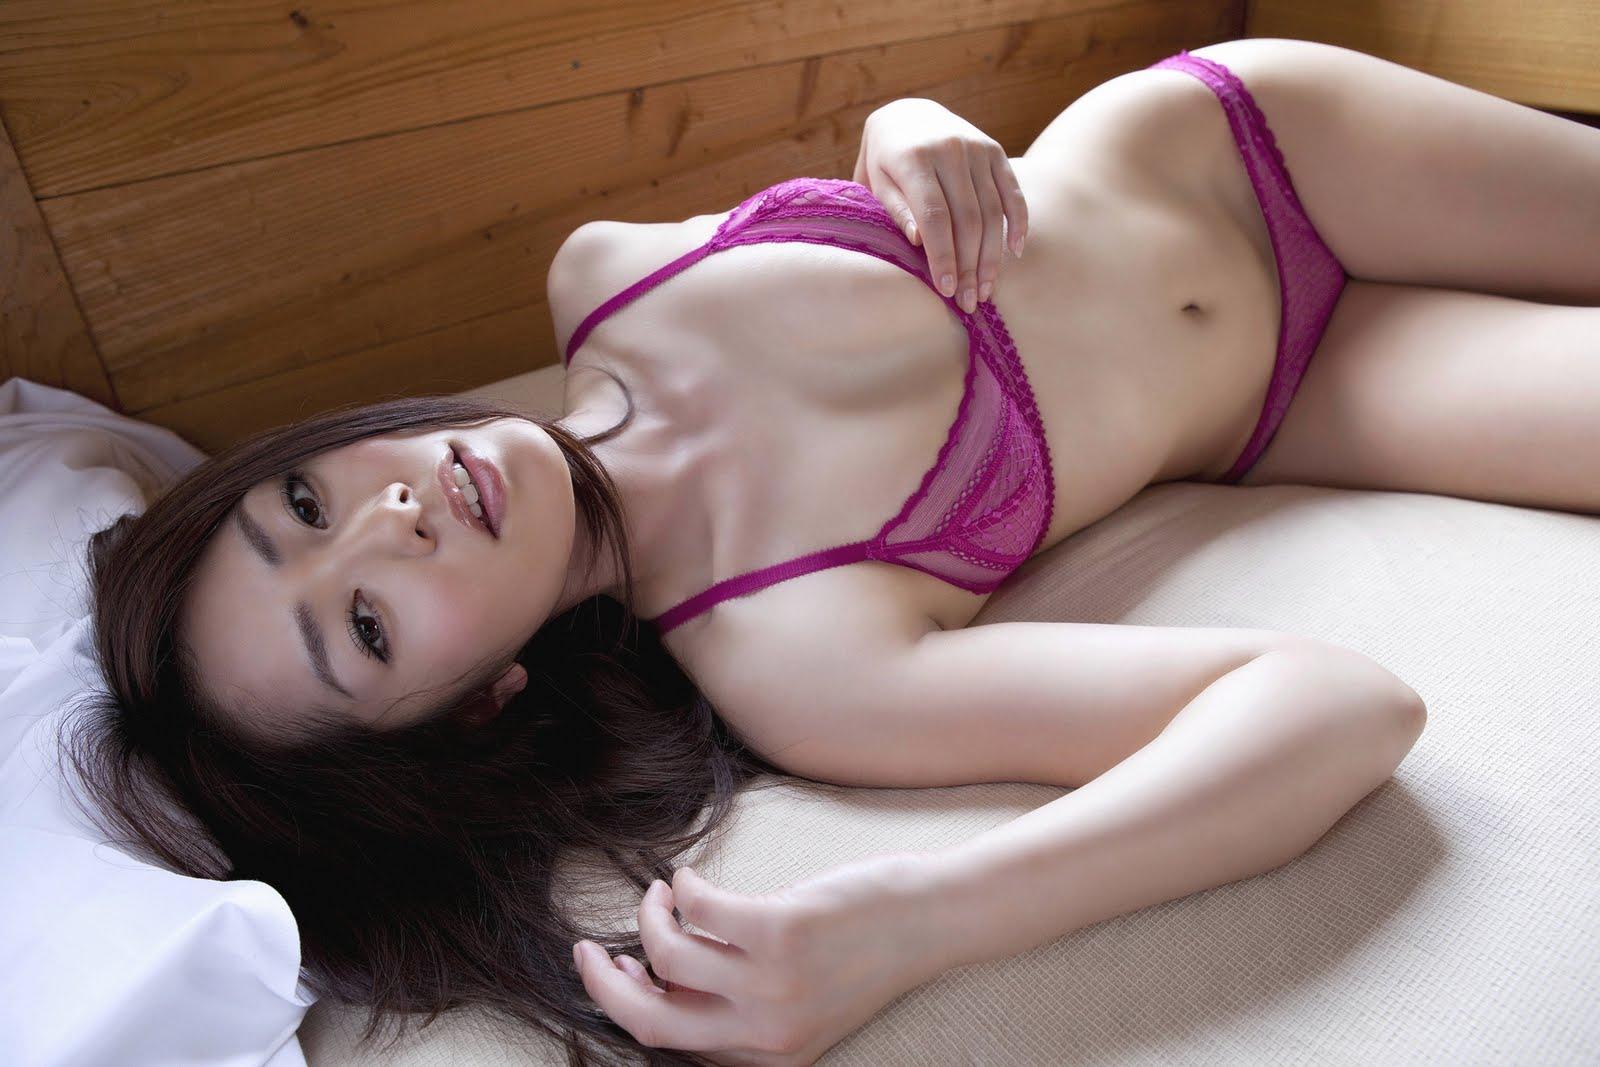 http://1.bp.blogspot.com/-GQTui3_gAeI/TkYDvXZnOmI/AAAAAAAAFhY/CXwNCAthIr8/s1600/Natsuki+Ikeda+-Gravure+Idol+%25288%2529.jpg